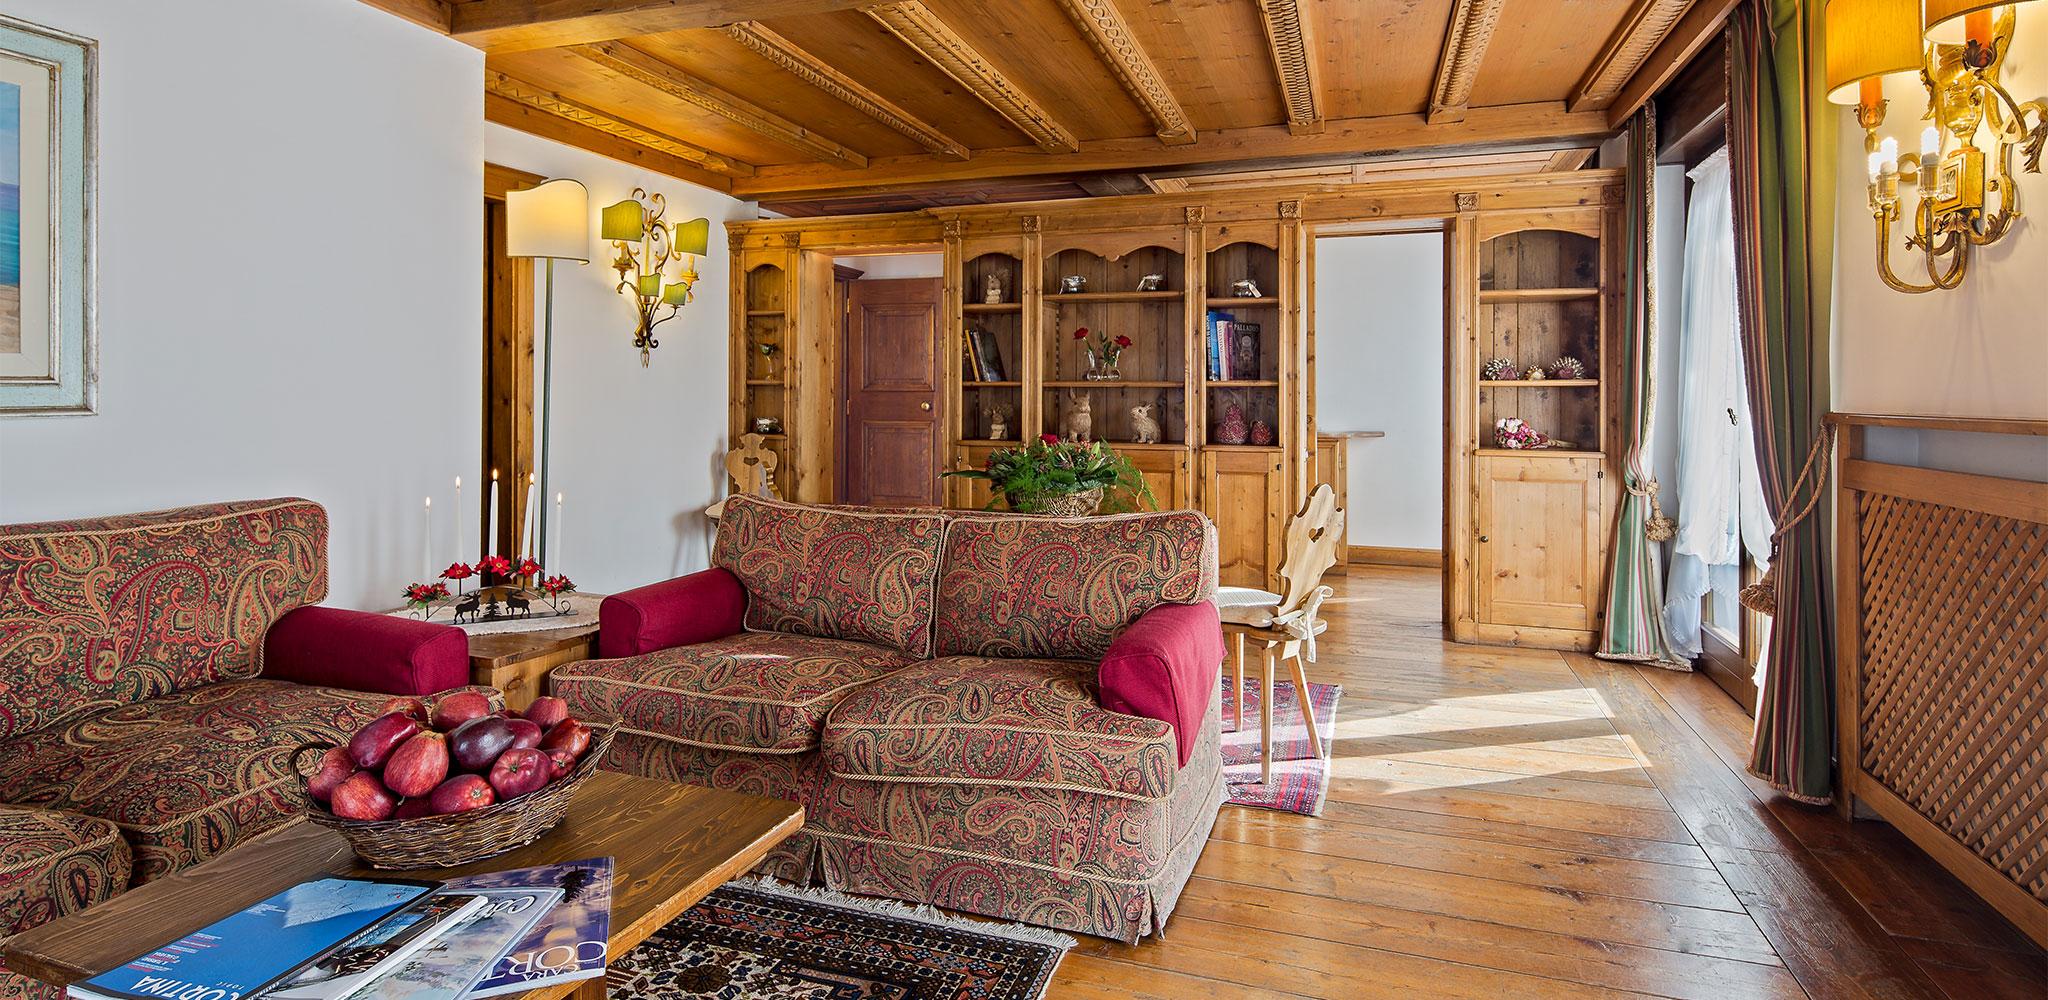 Photo gallery hotel bellevue suites spa official site for 7 salon bellevue